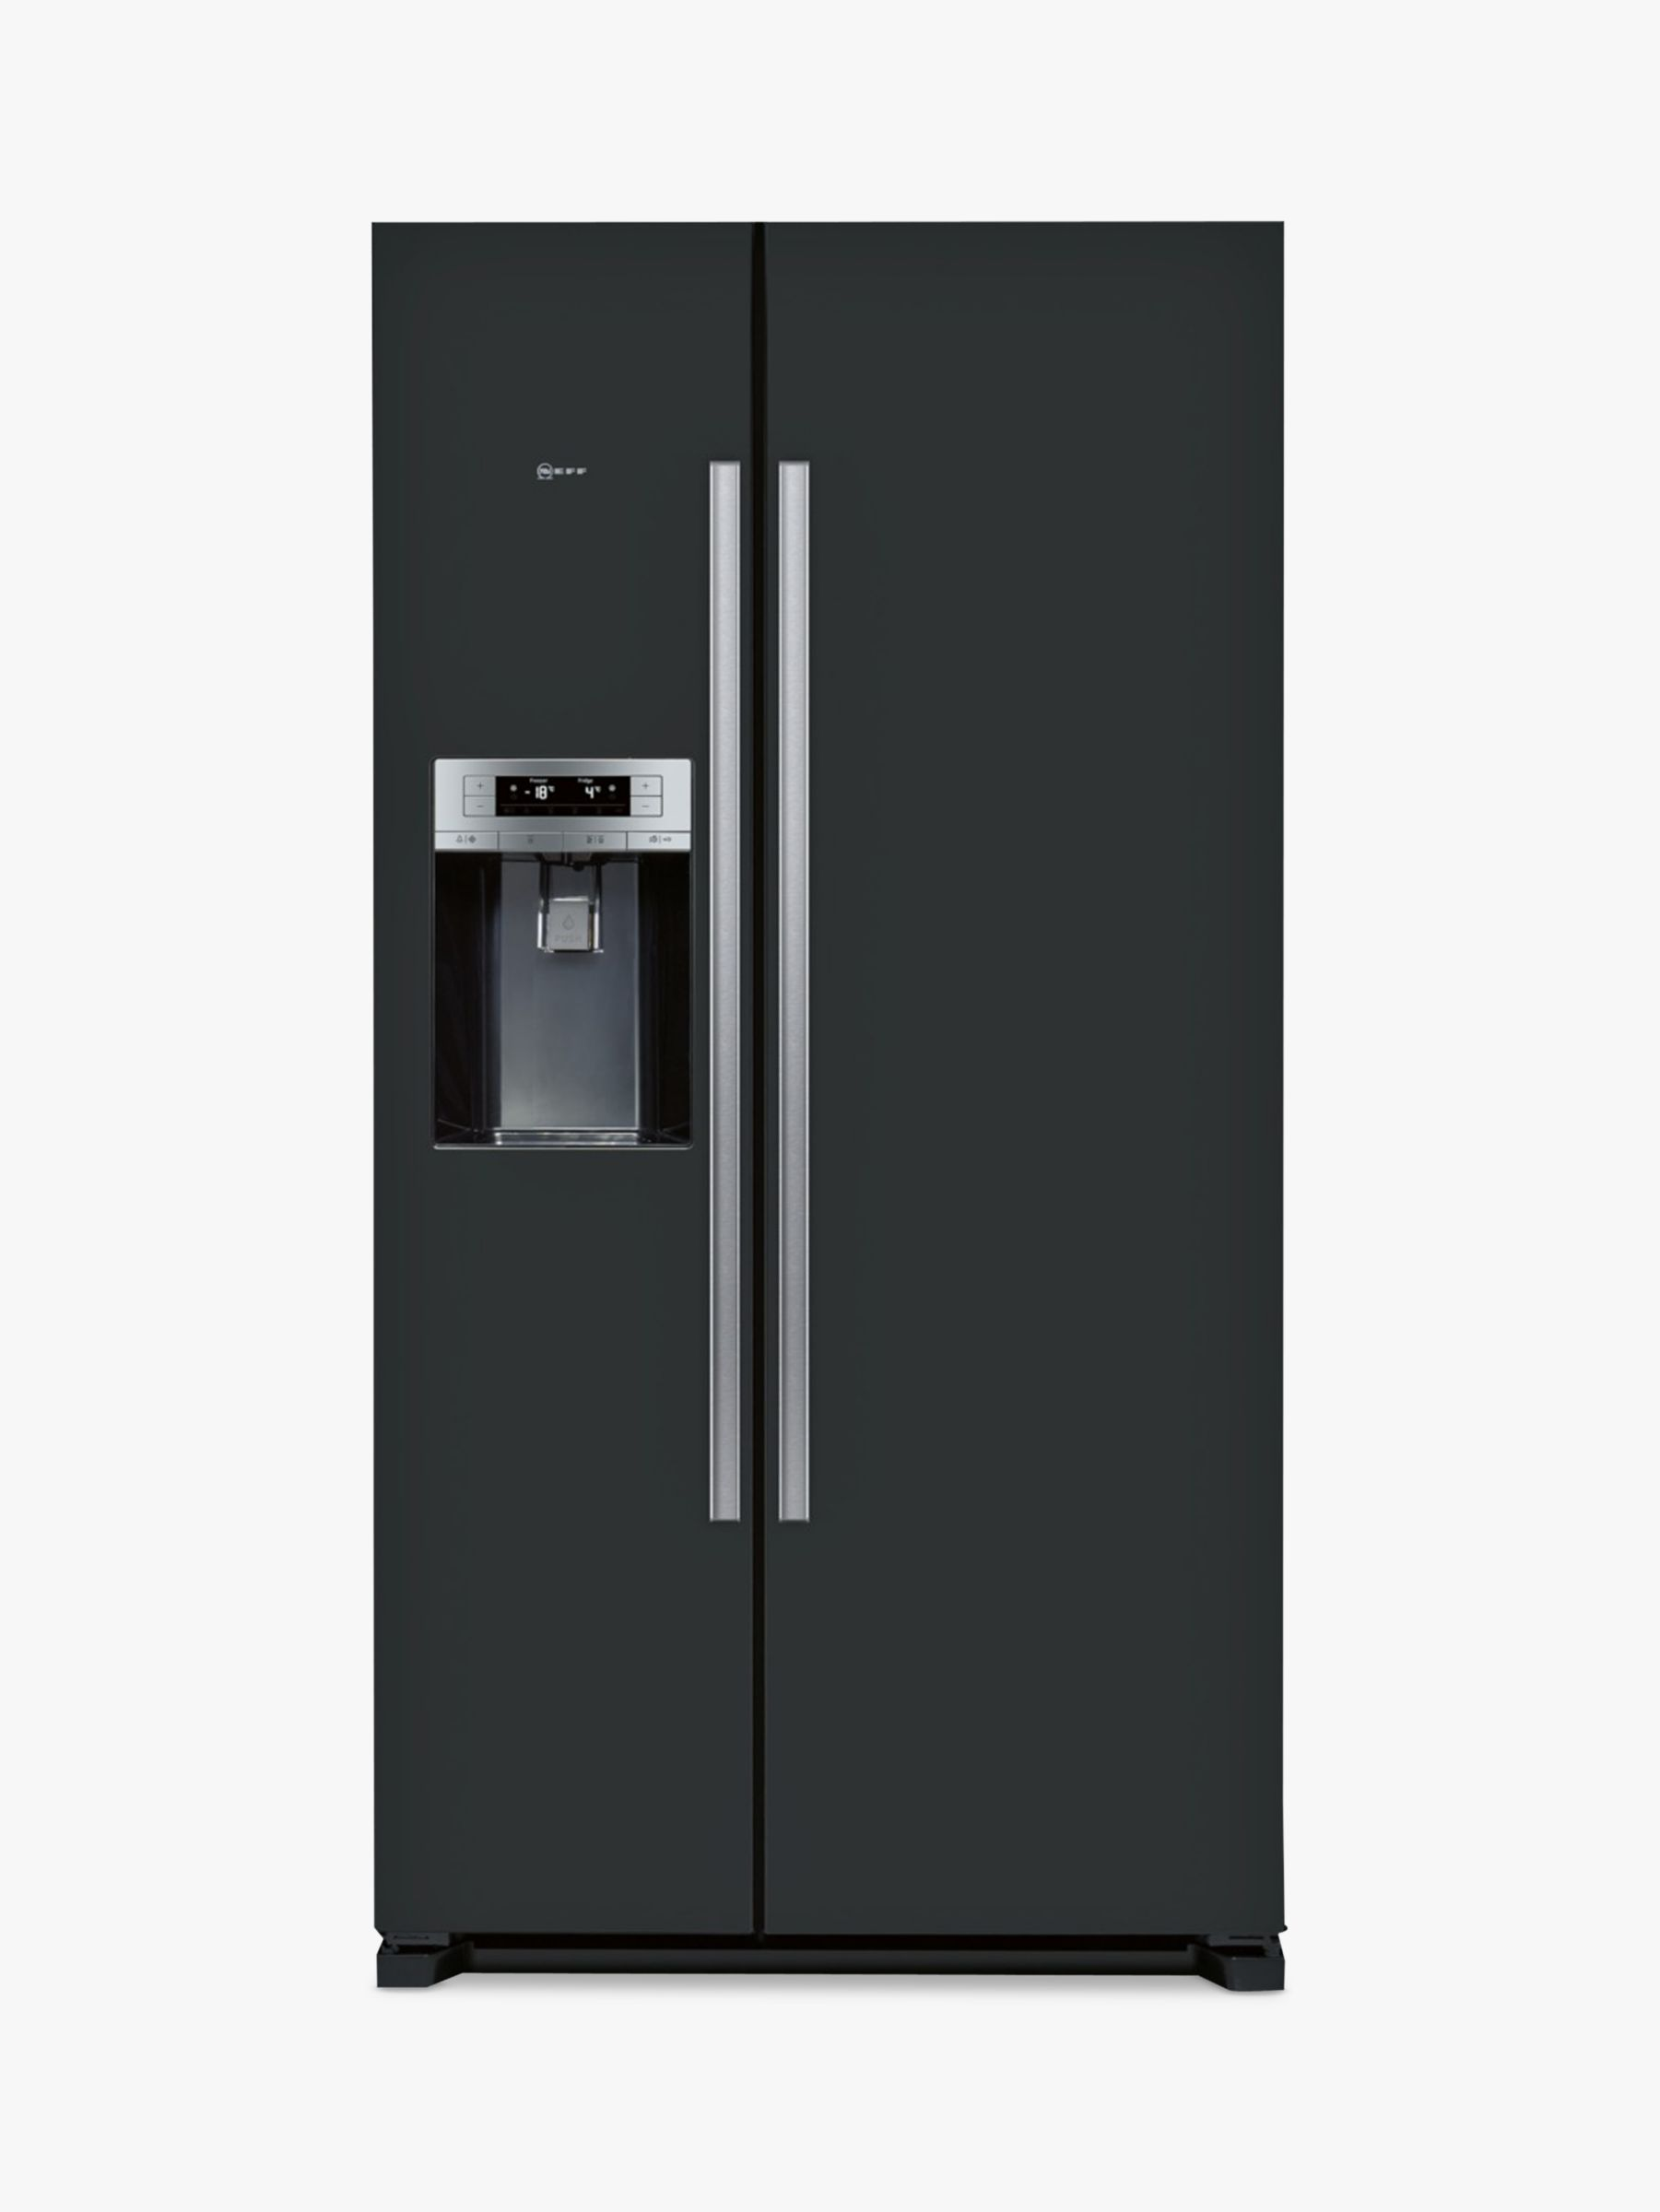 NEFF Neff KA3902B20G American Style Fridge Freezer, A+ Energy Rating, 91cm Wide, Black